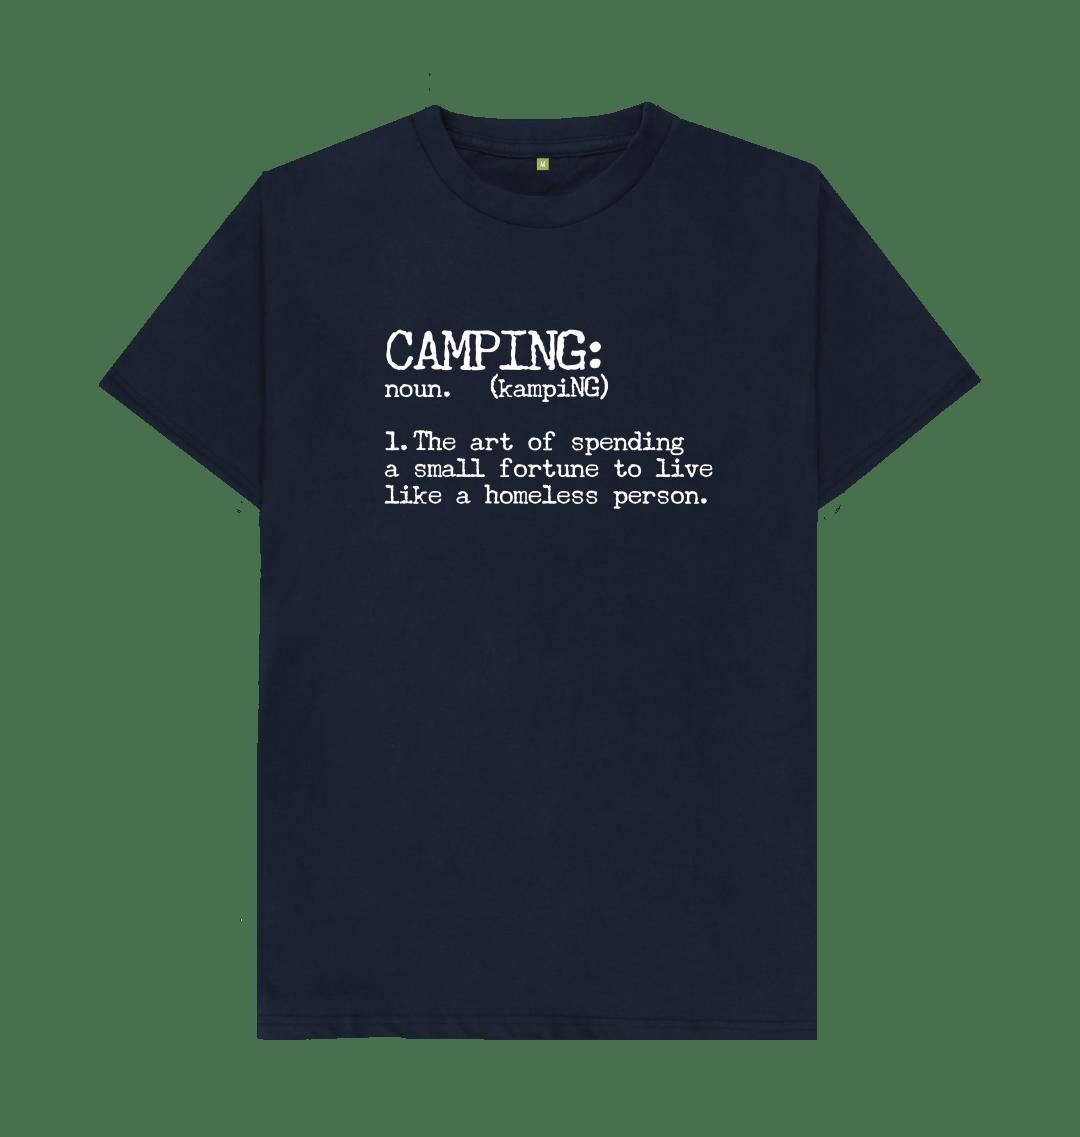 Camping Definition Funny Mens T Shirt Top - Organic Cotton, Vegan navy